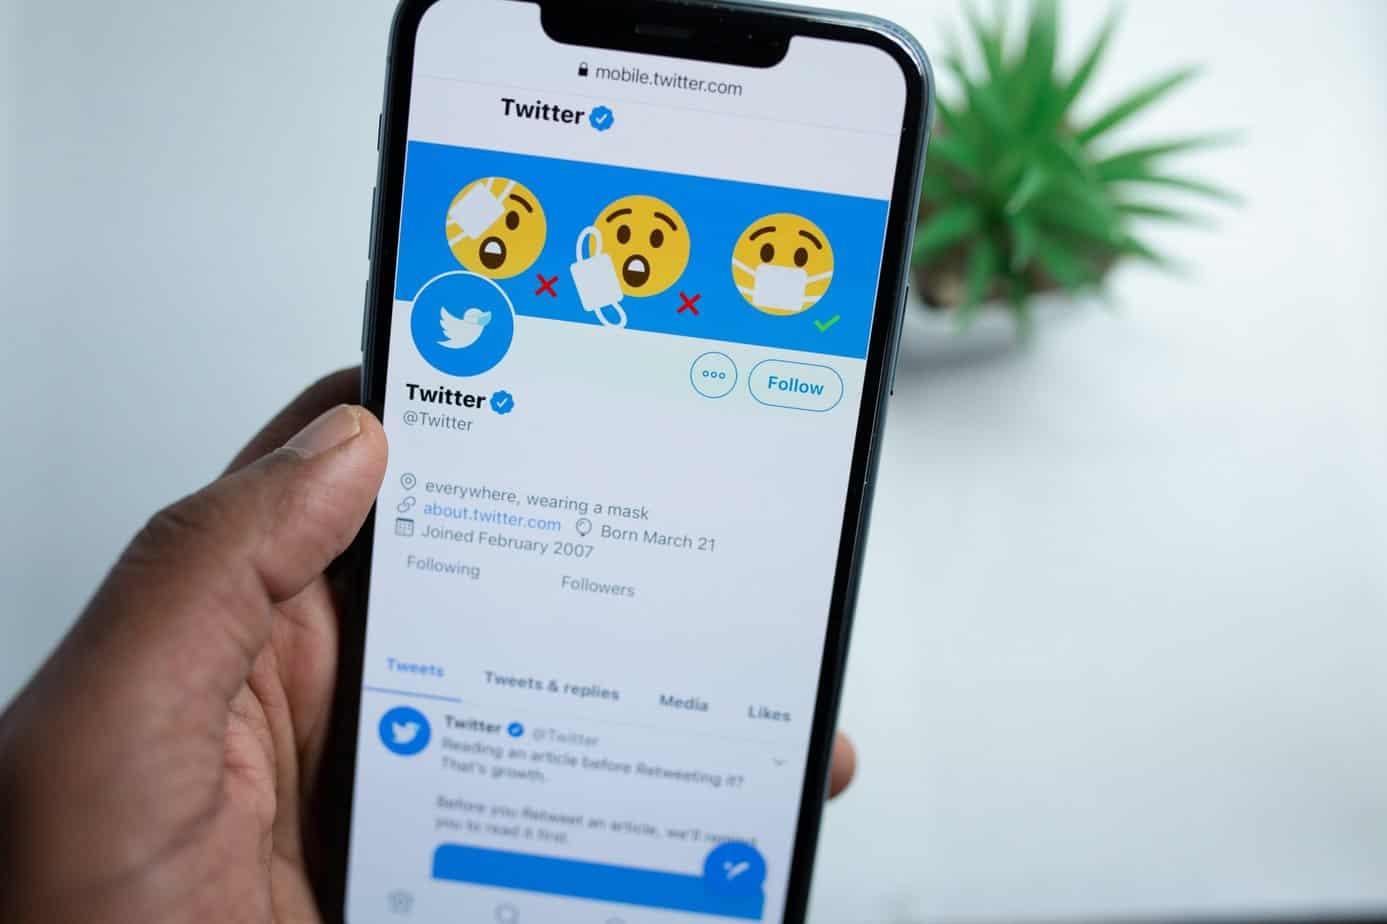 Top 5 Twitter Tools